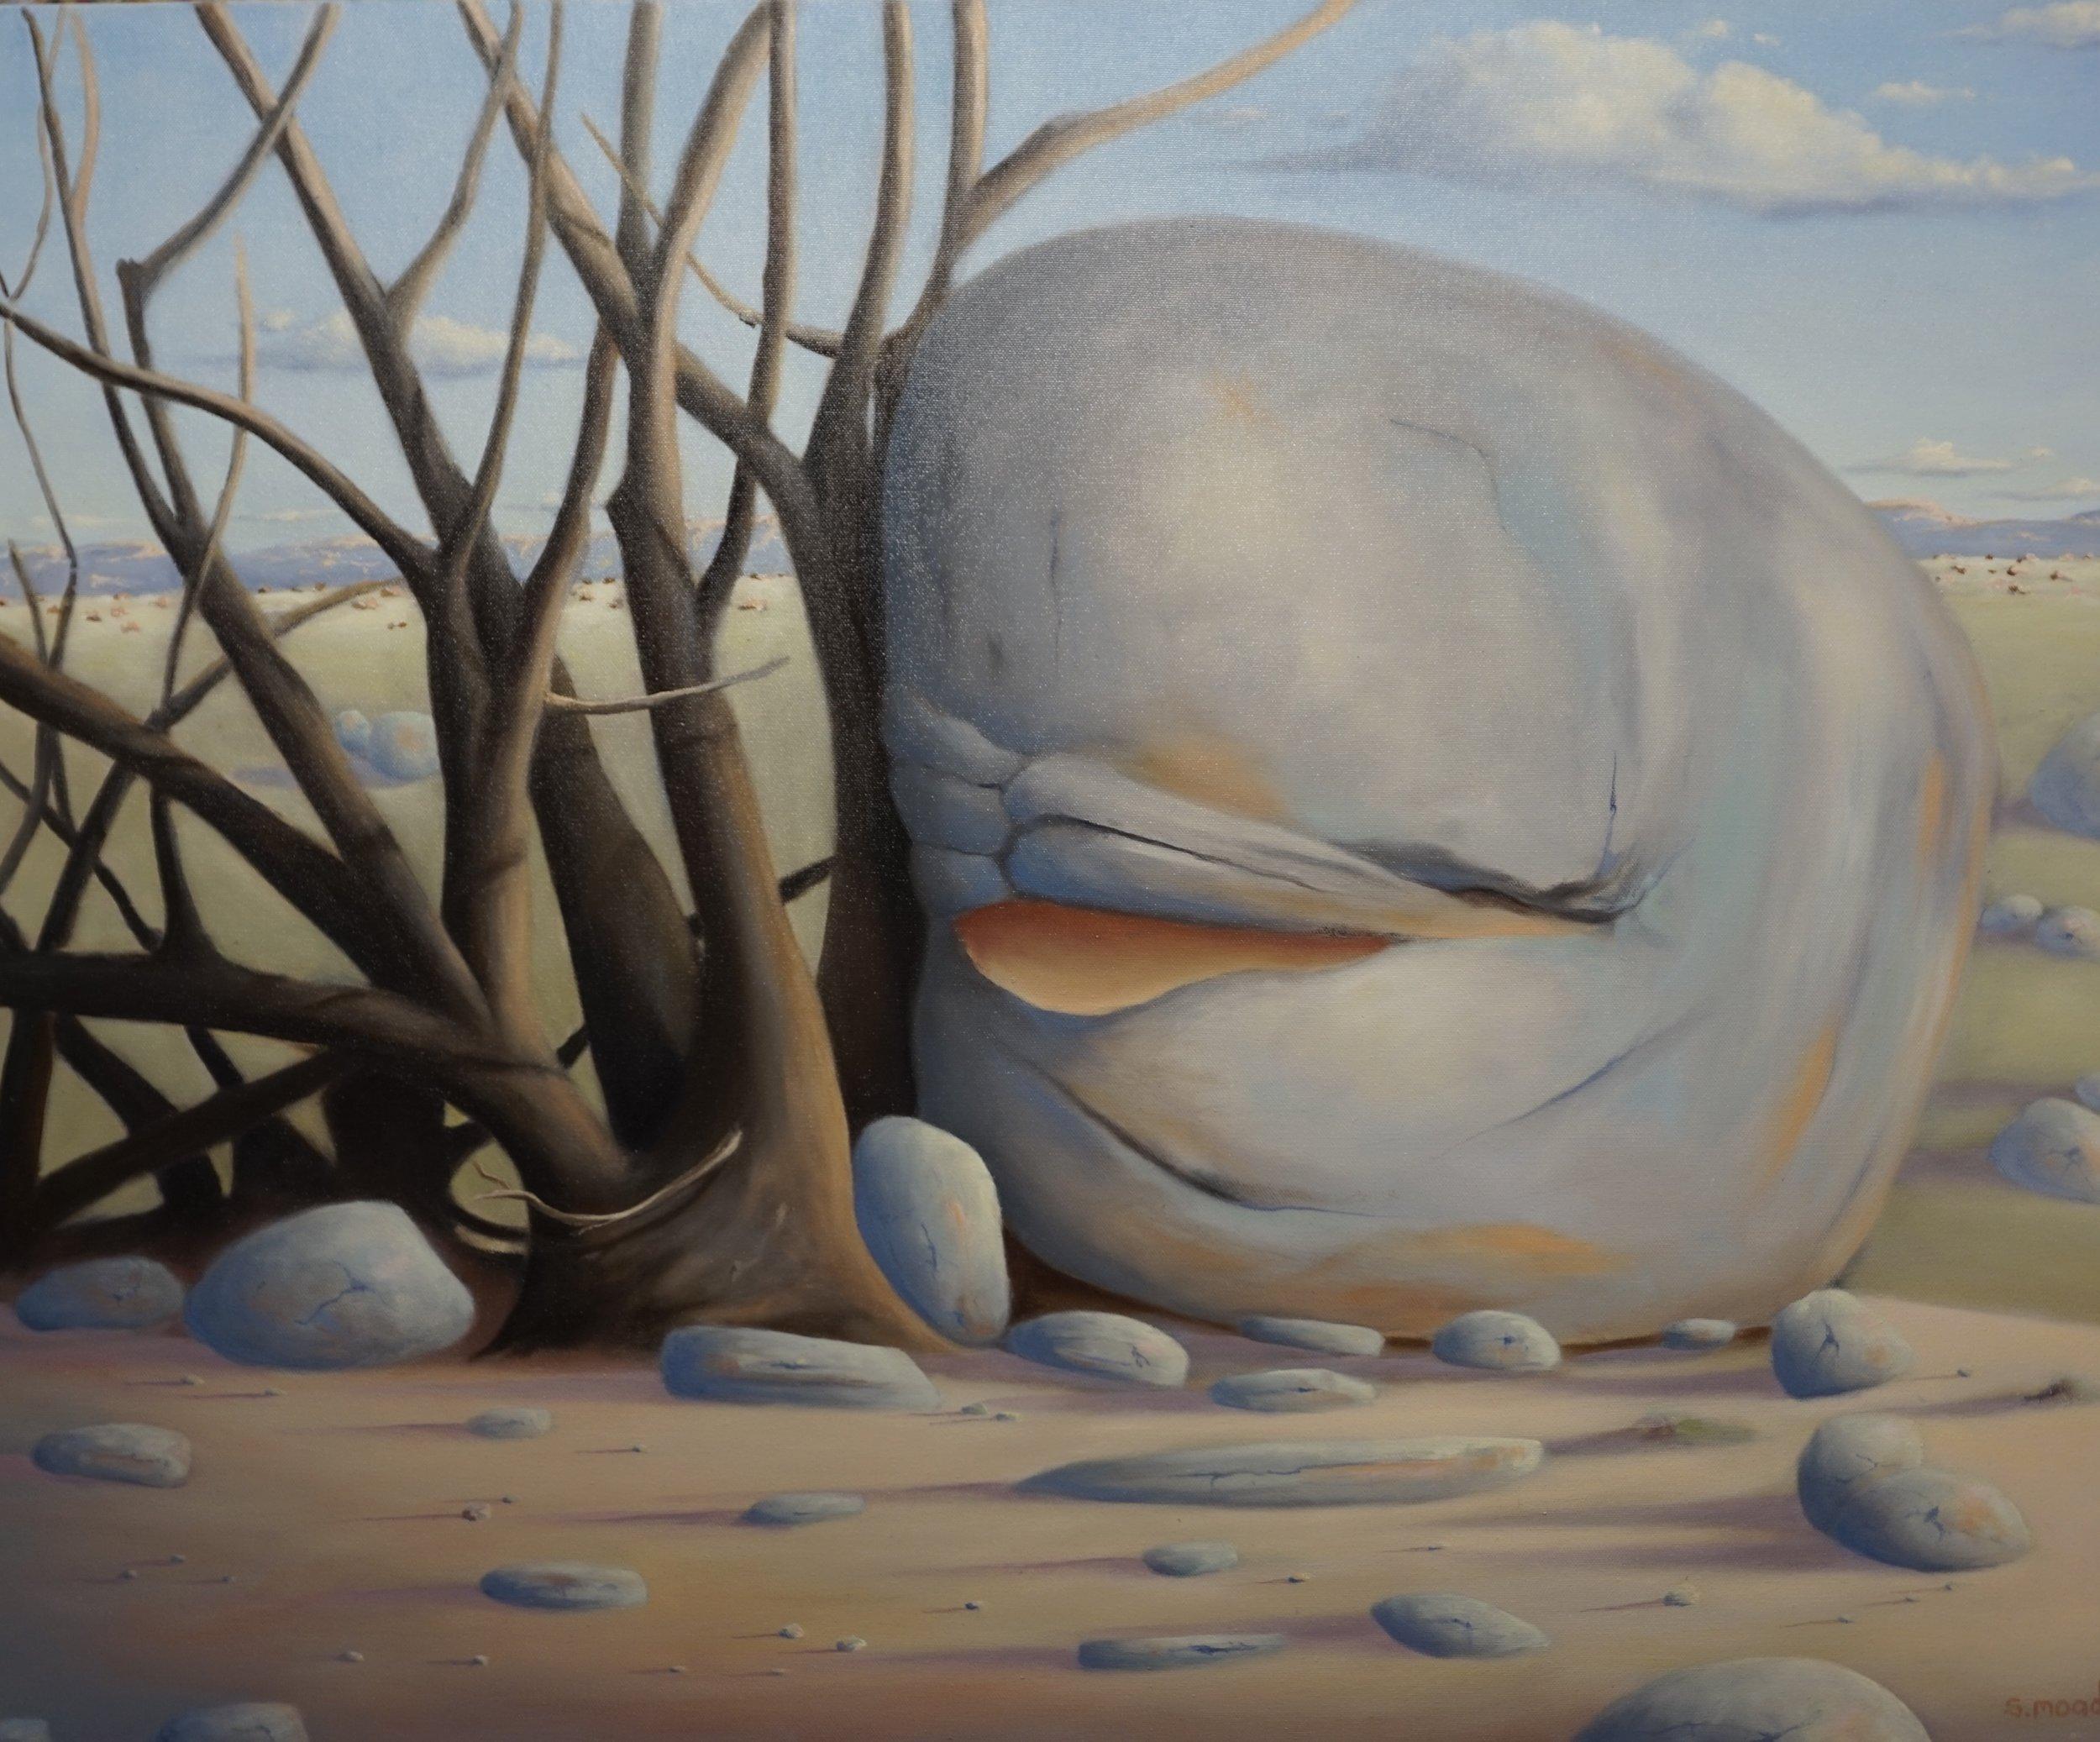 """Dolphin Rock - Wheatbelt""   Oil on canvas  Size: 92cm x 76cm  Price:  $2,800"